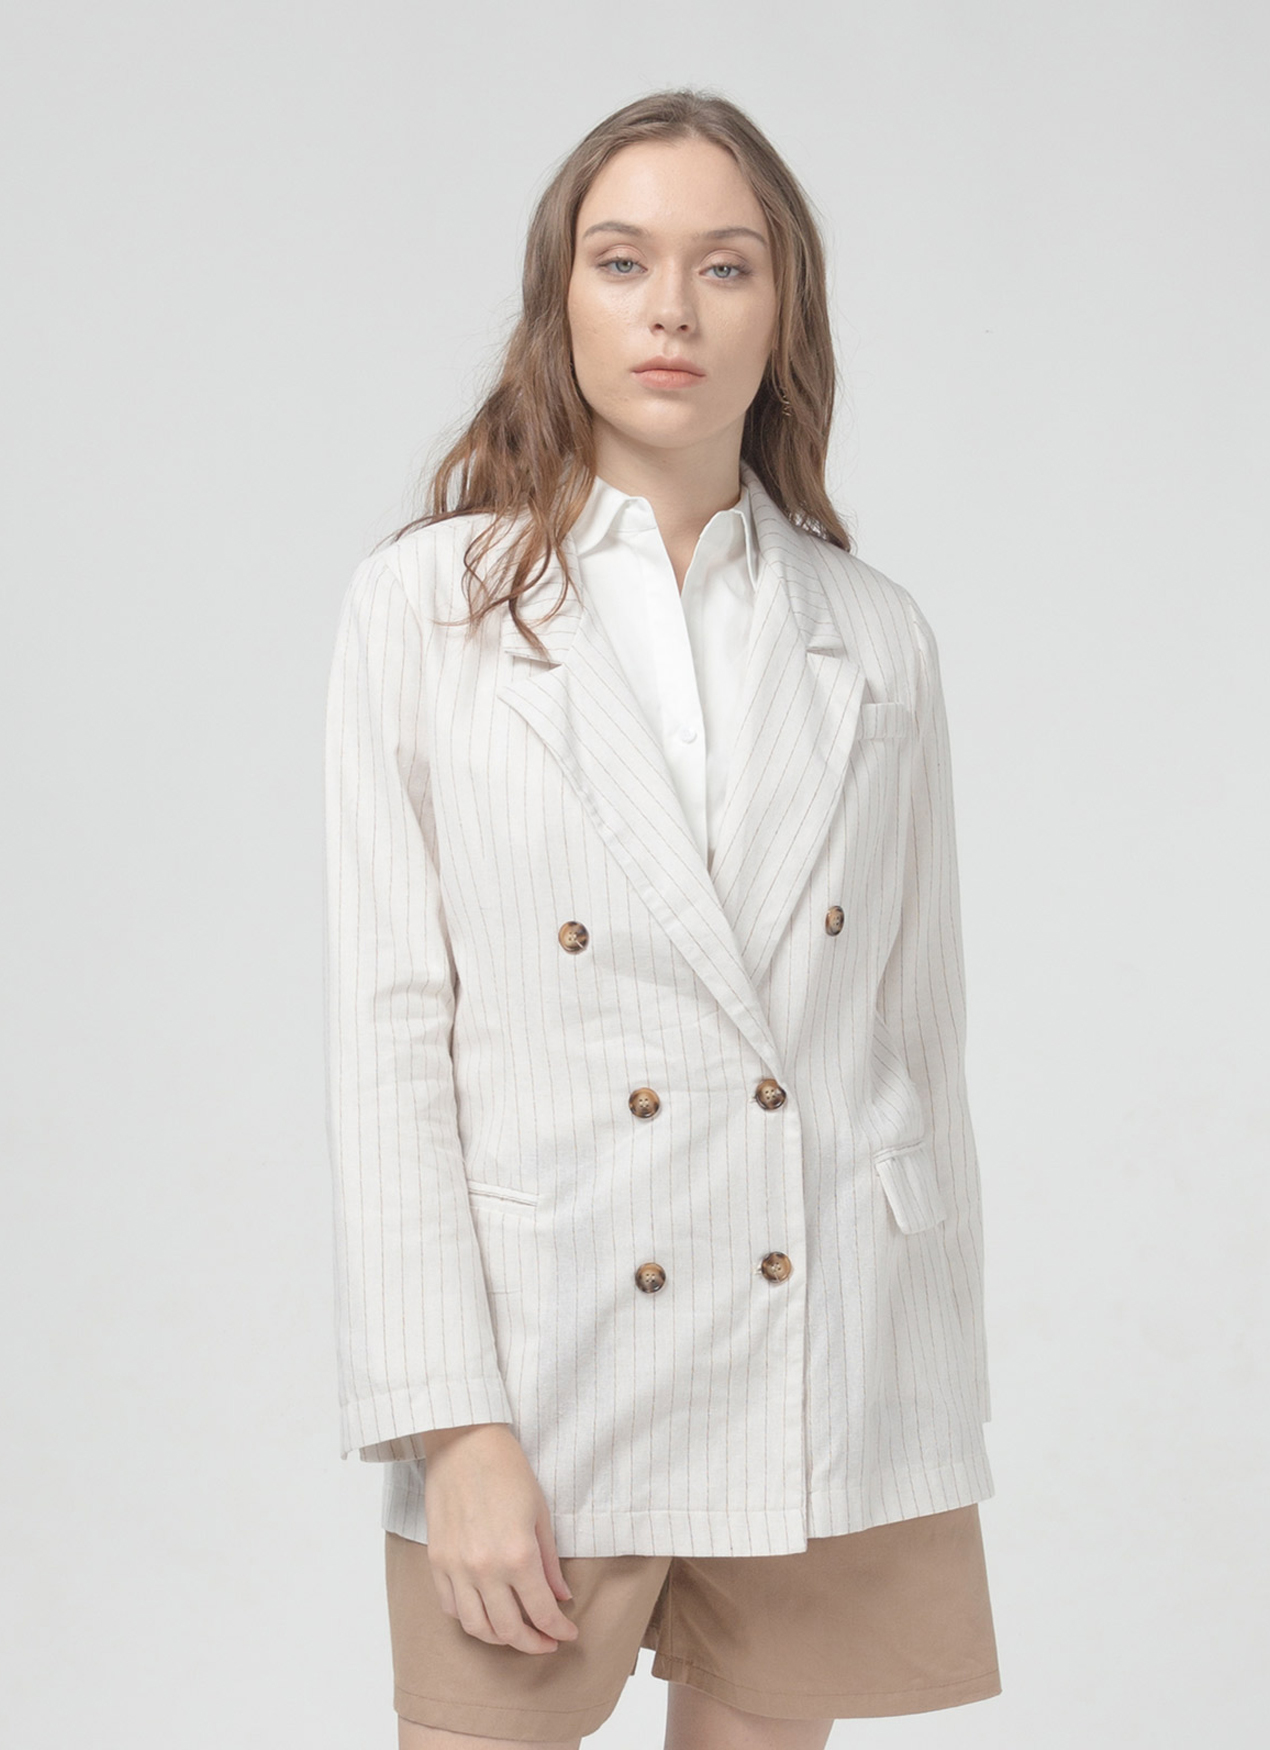 #PopbelaOOTD: Blazer untuk Kesan Vintage & Timeless